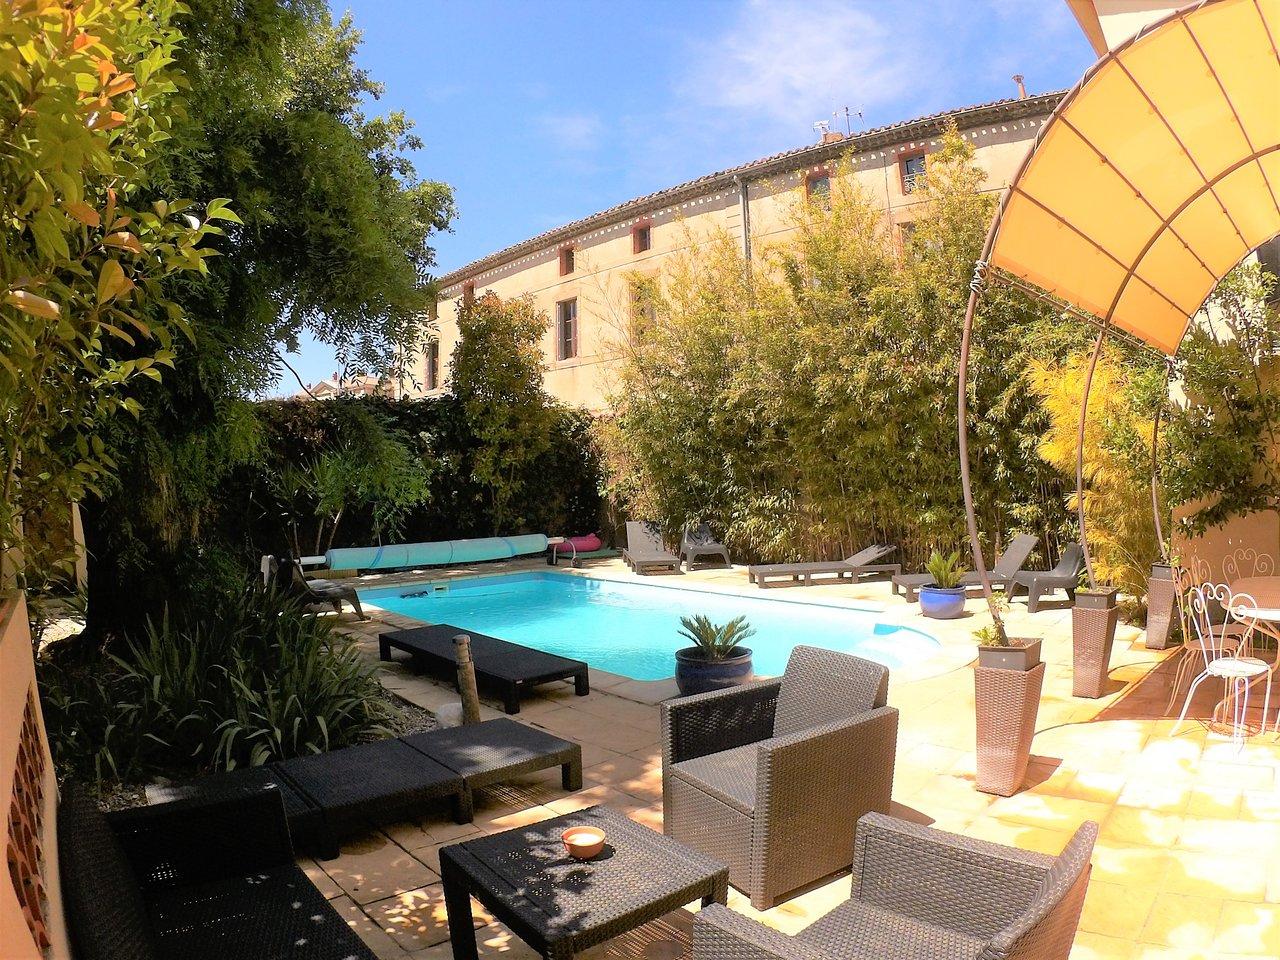 La Villa-Carcassonne (Carcassonne Center, Fransa) - Oda Ve ... concernant Piscine Mazamet